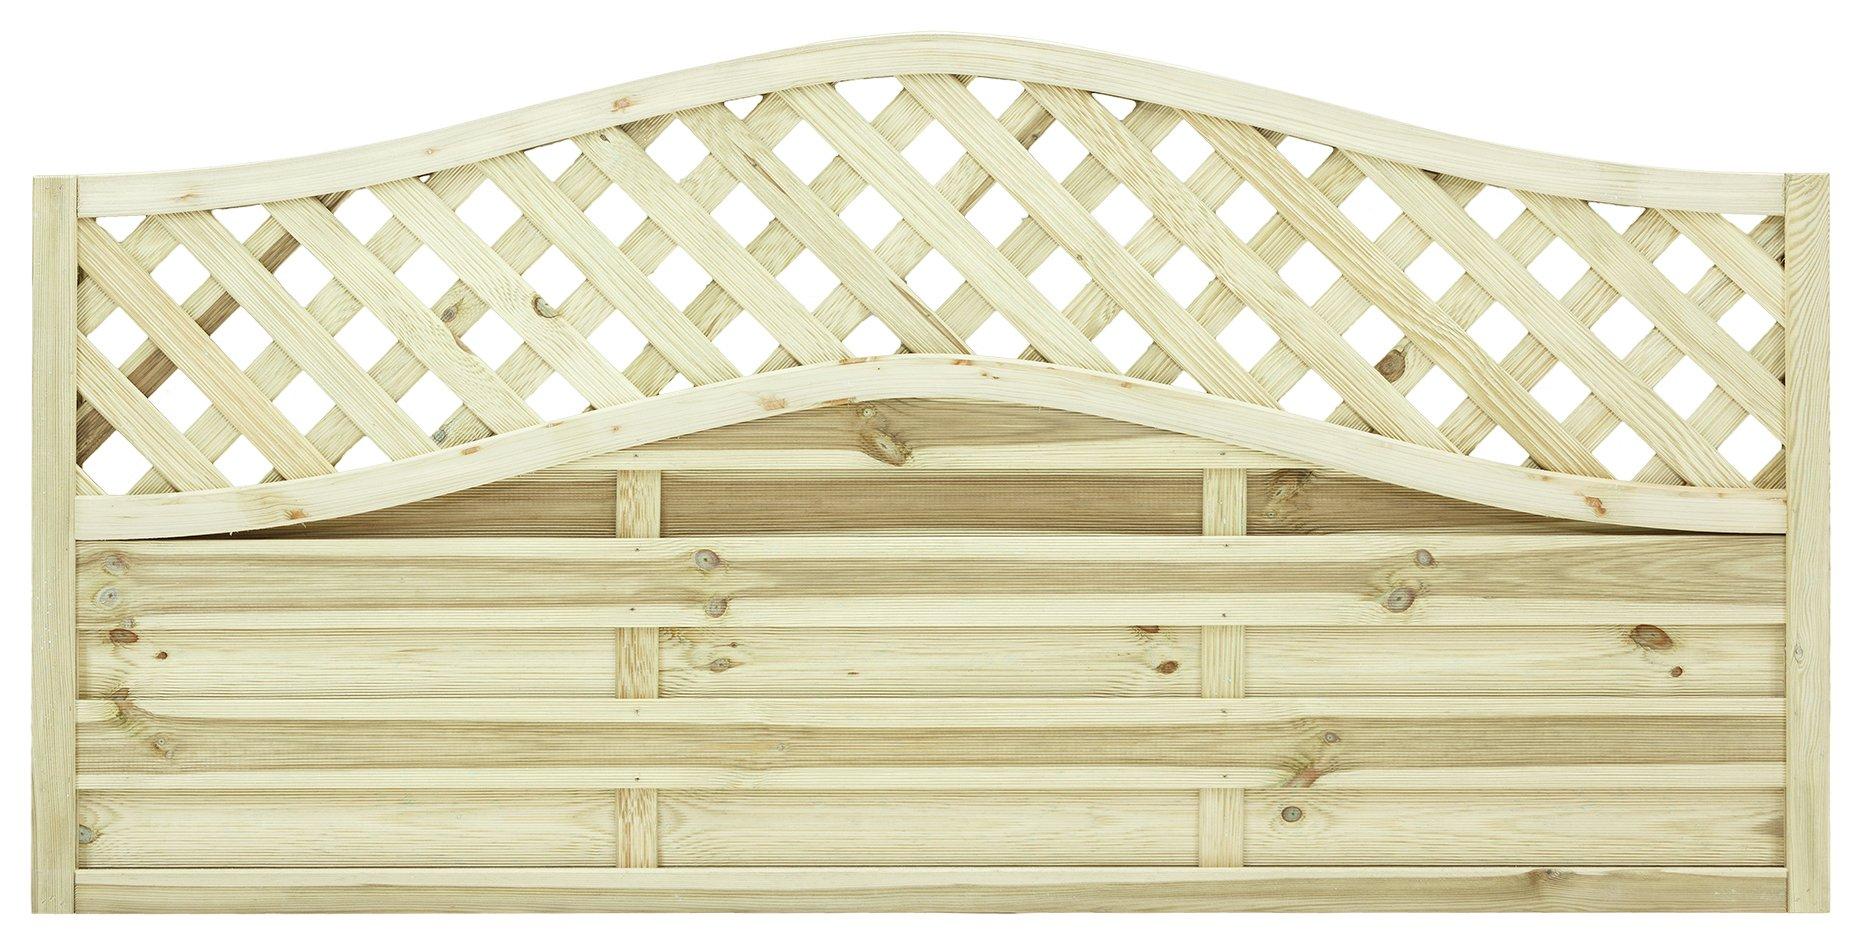 Grange 0.9m Elite St Meloir Fence Panel - Pack of 4. lowest price